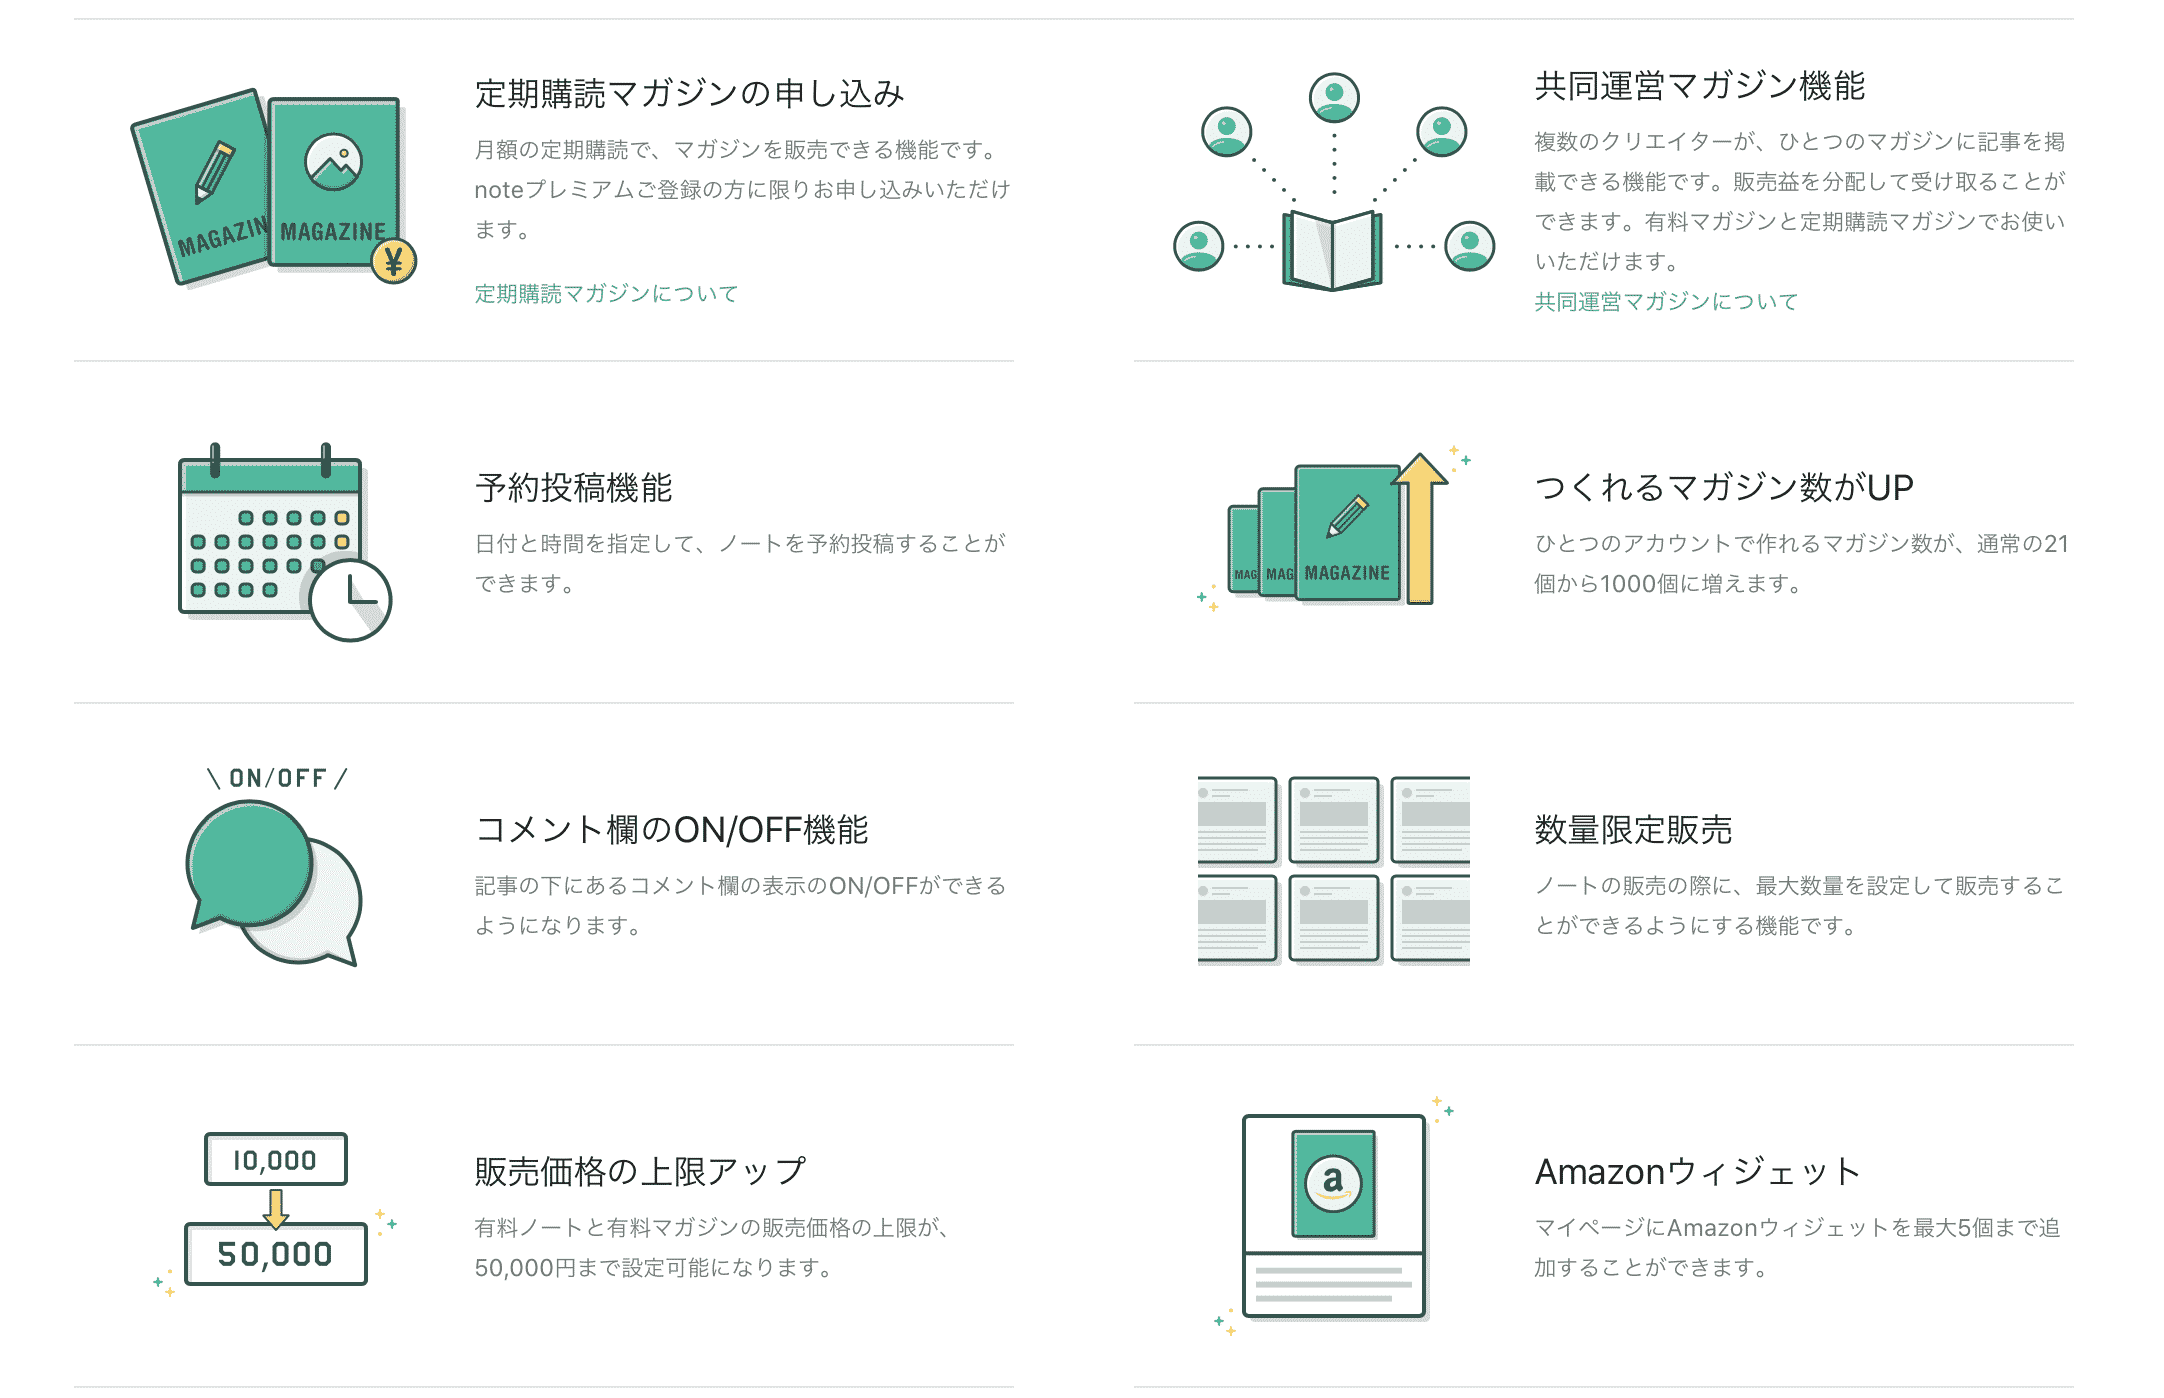 note(ノート)の基本情報